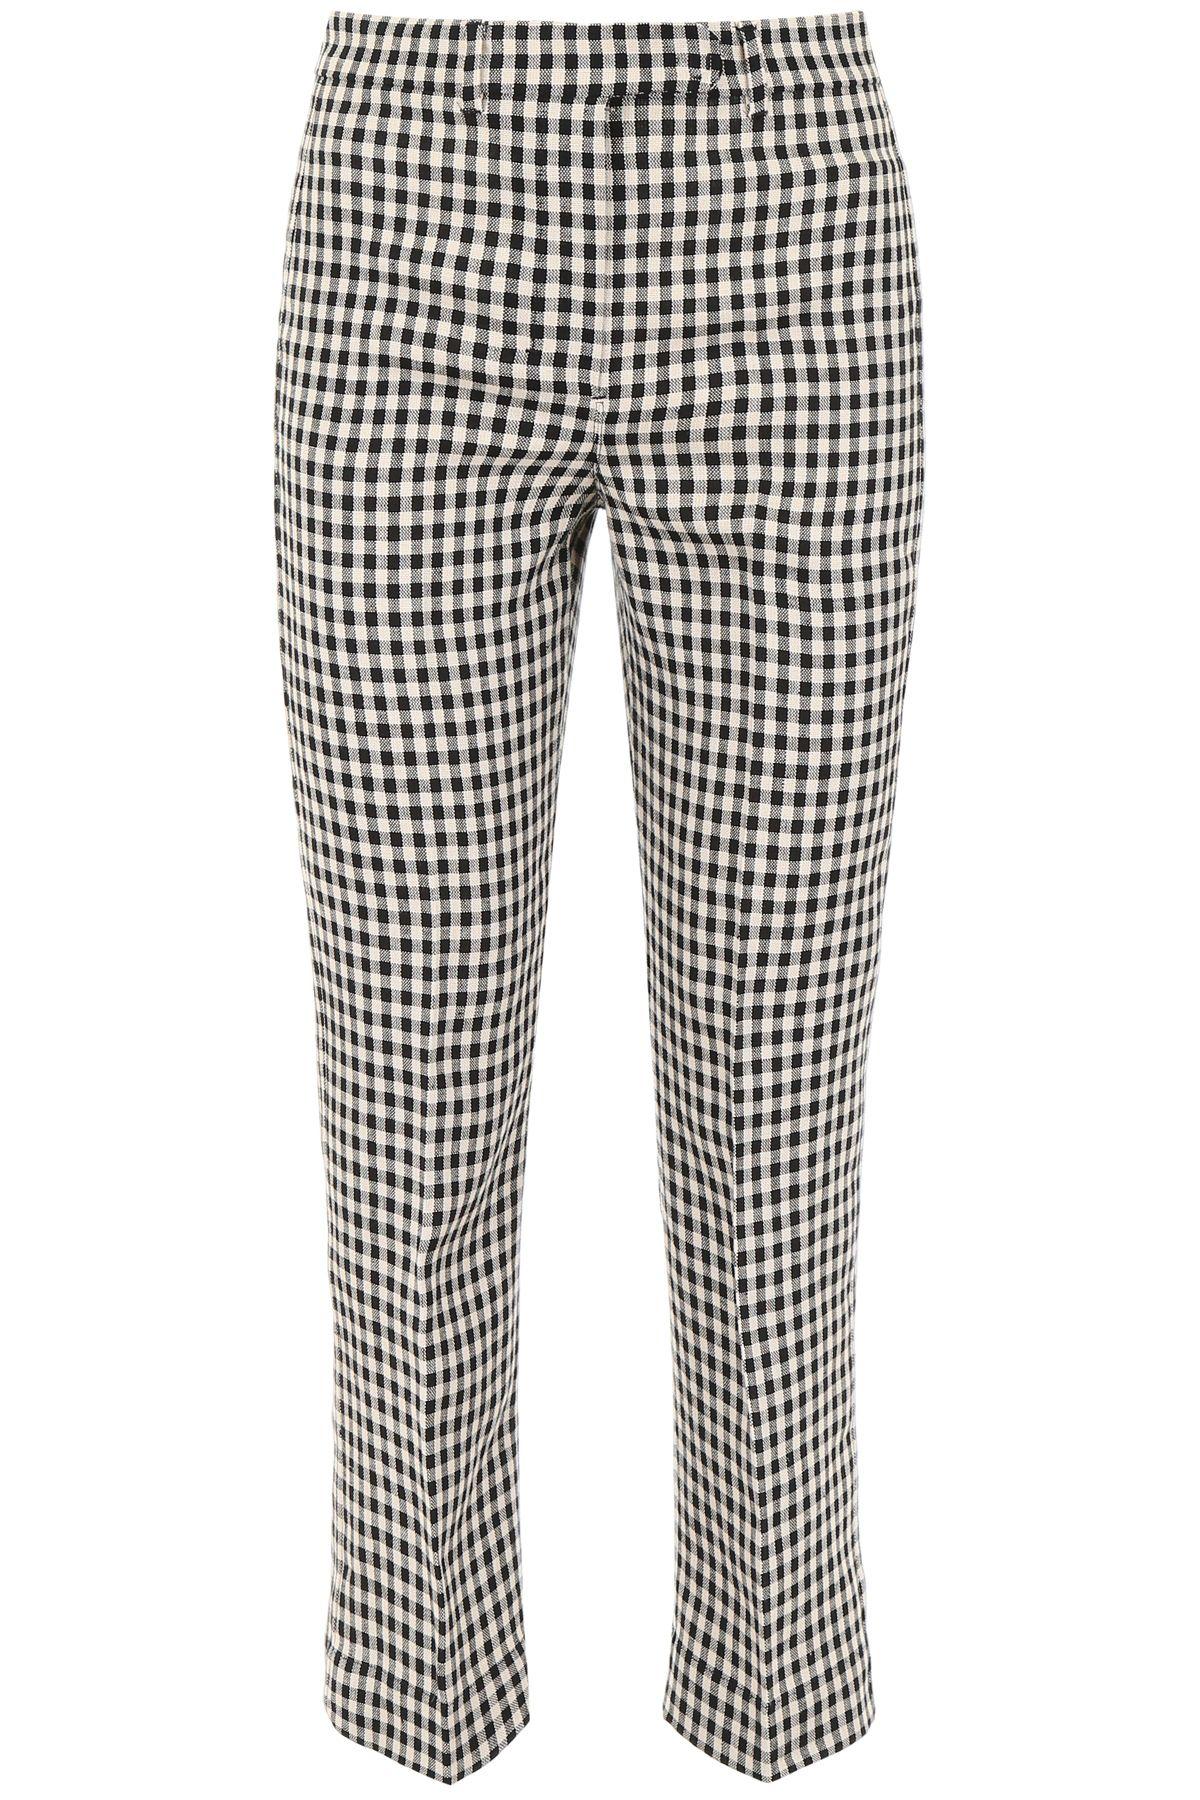 c4fef4b3ab7a9 'S Max Mara Here is The Cube Gingham Linen Trousers - QUADRETTO NERO ECRU  ...